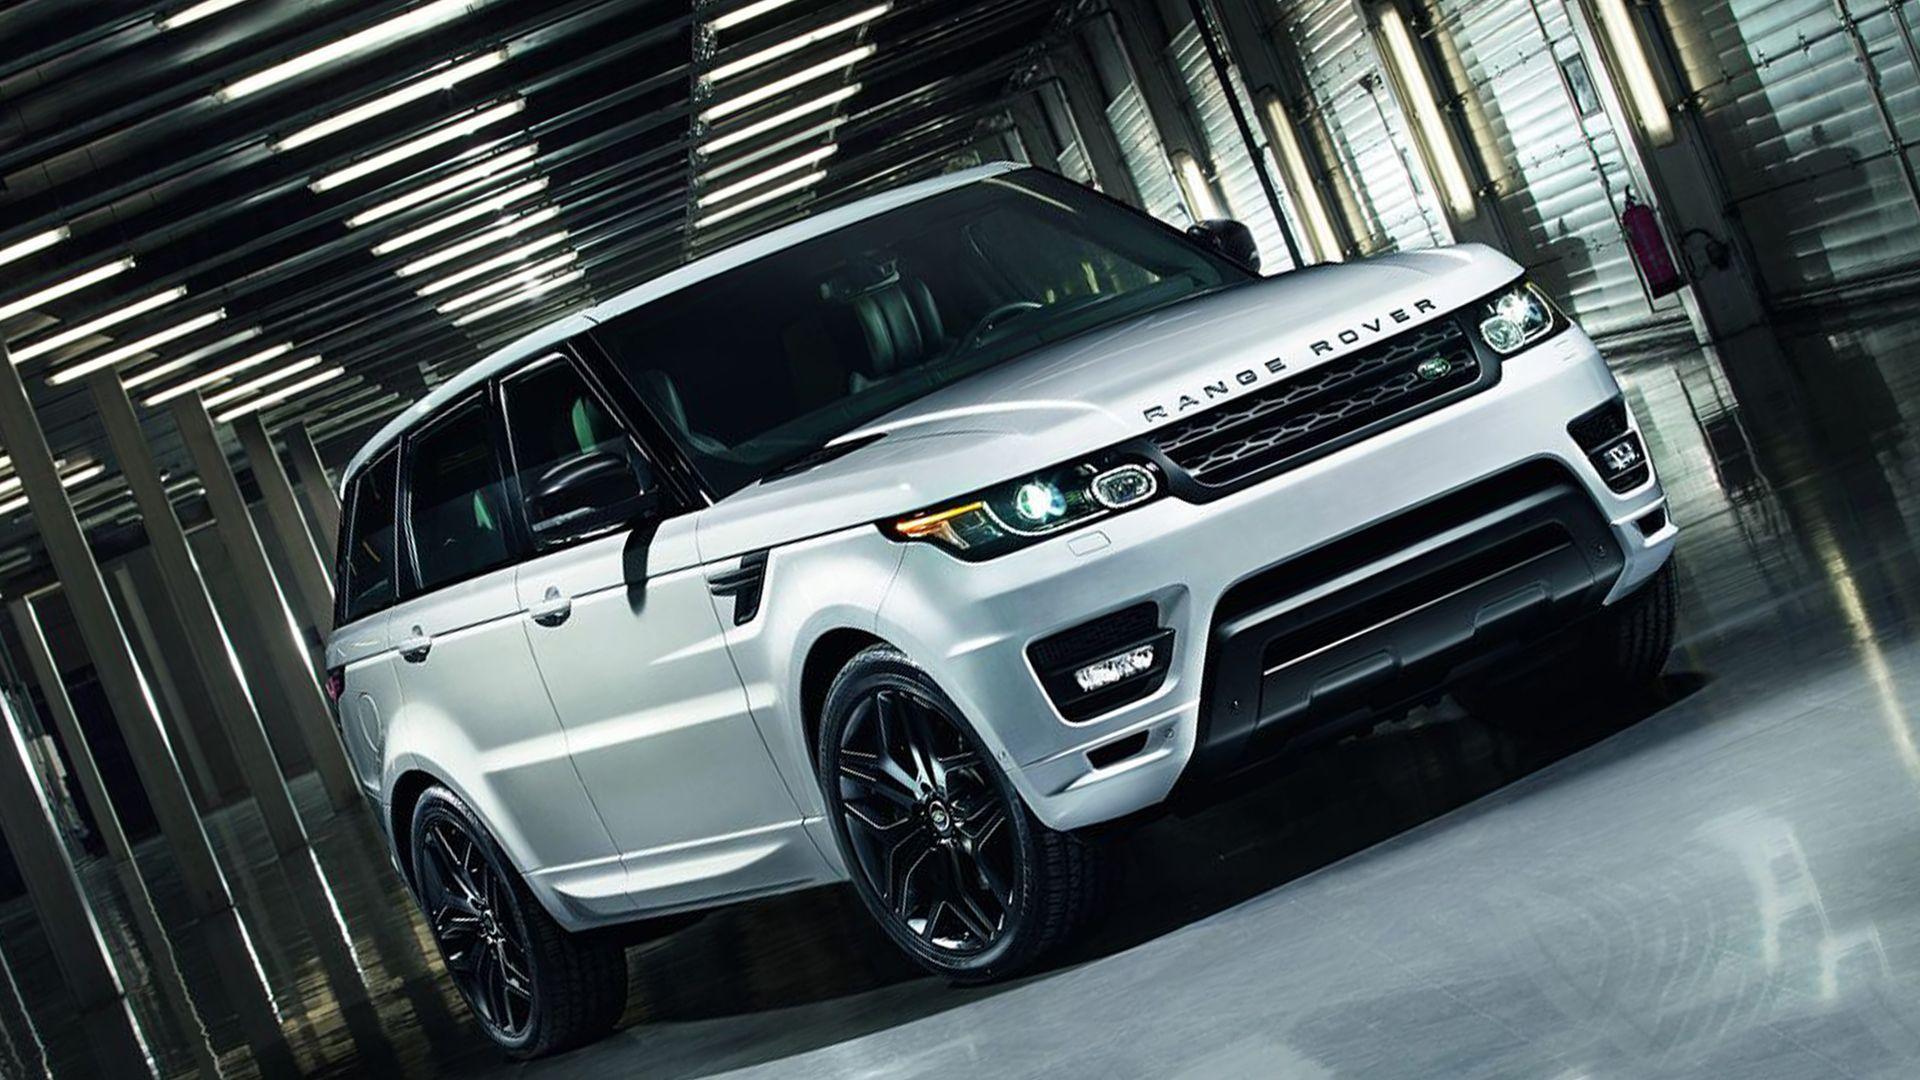 2019 Range Rover Sport Release Date Range rover sport